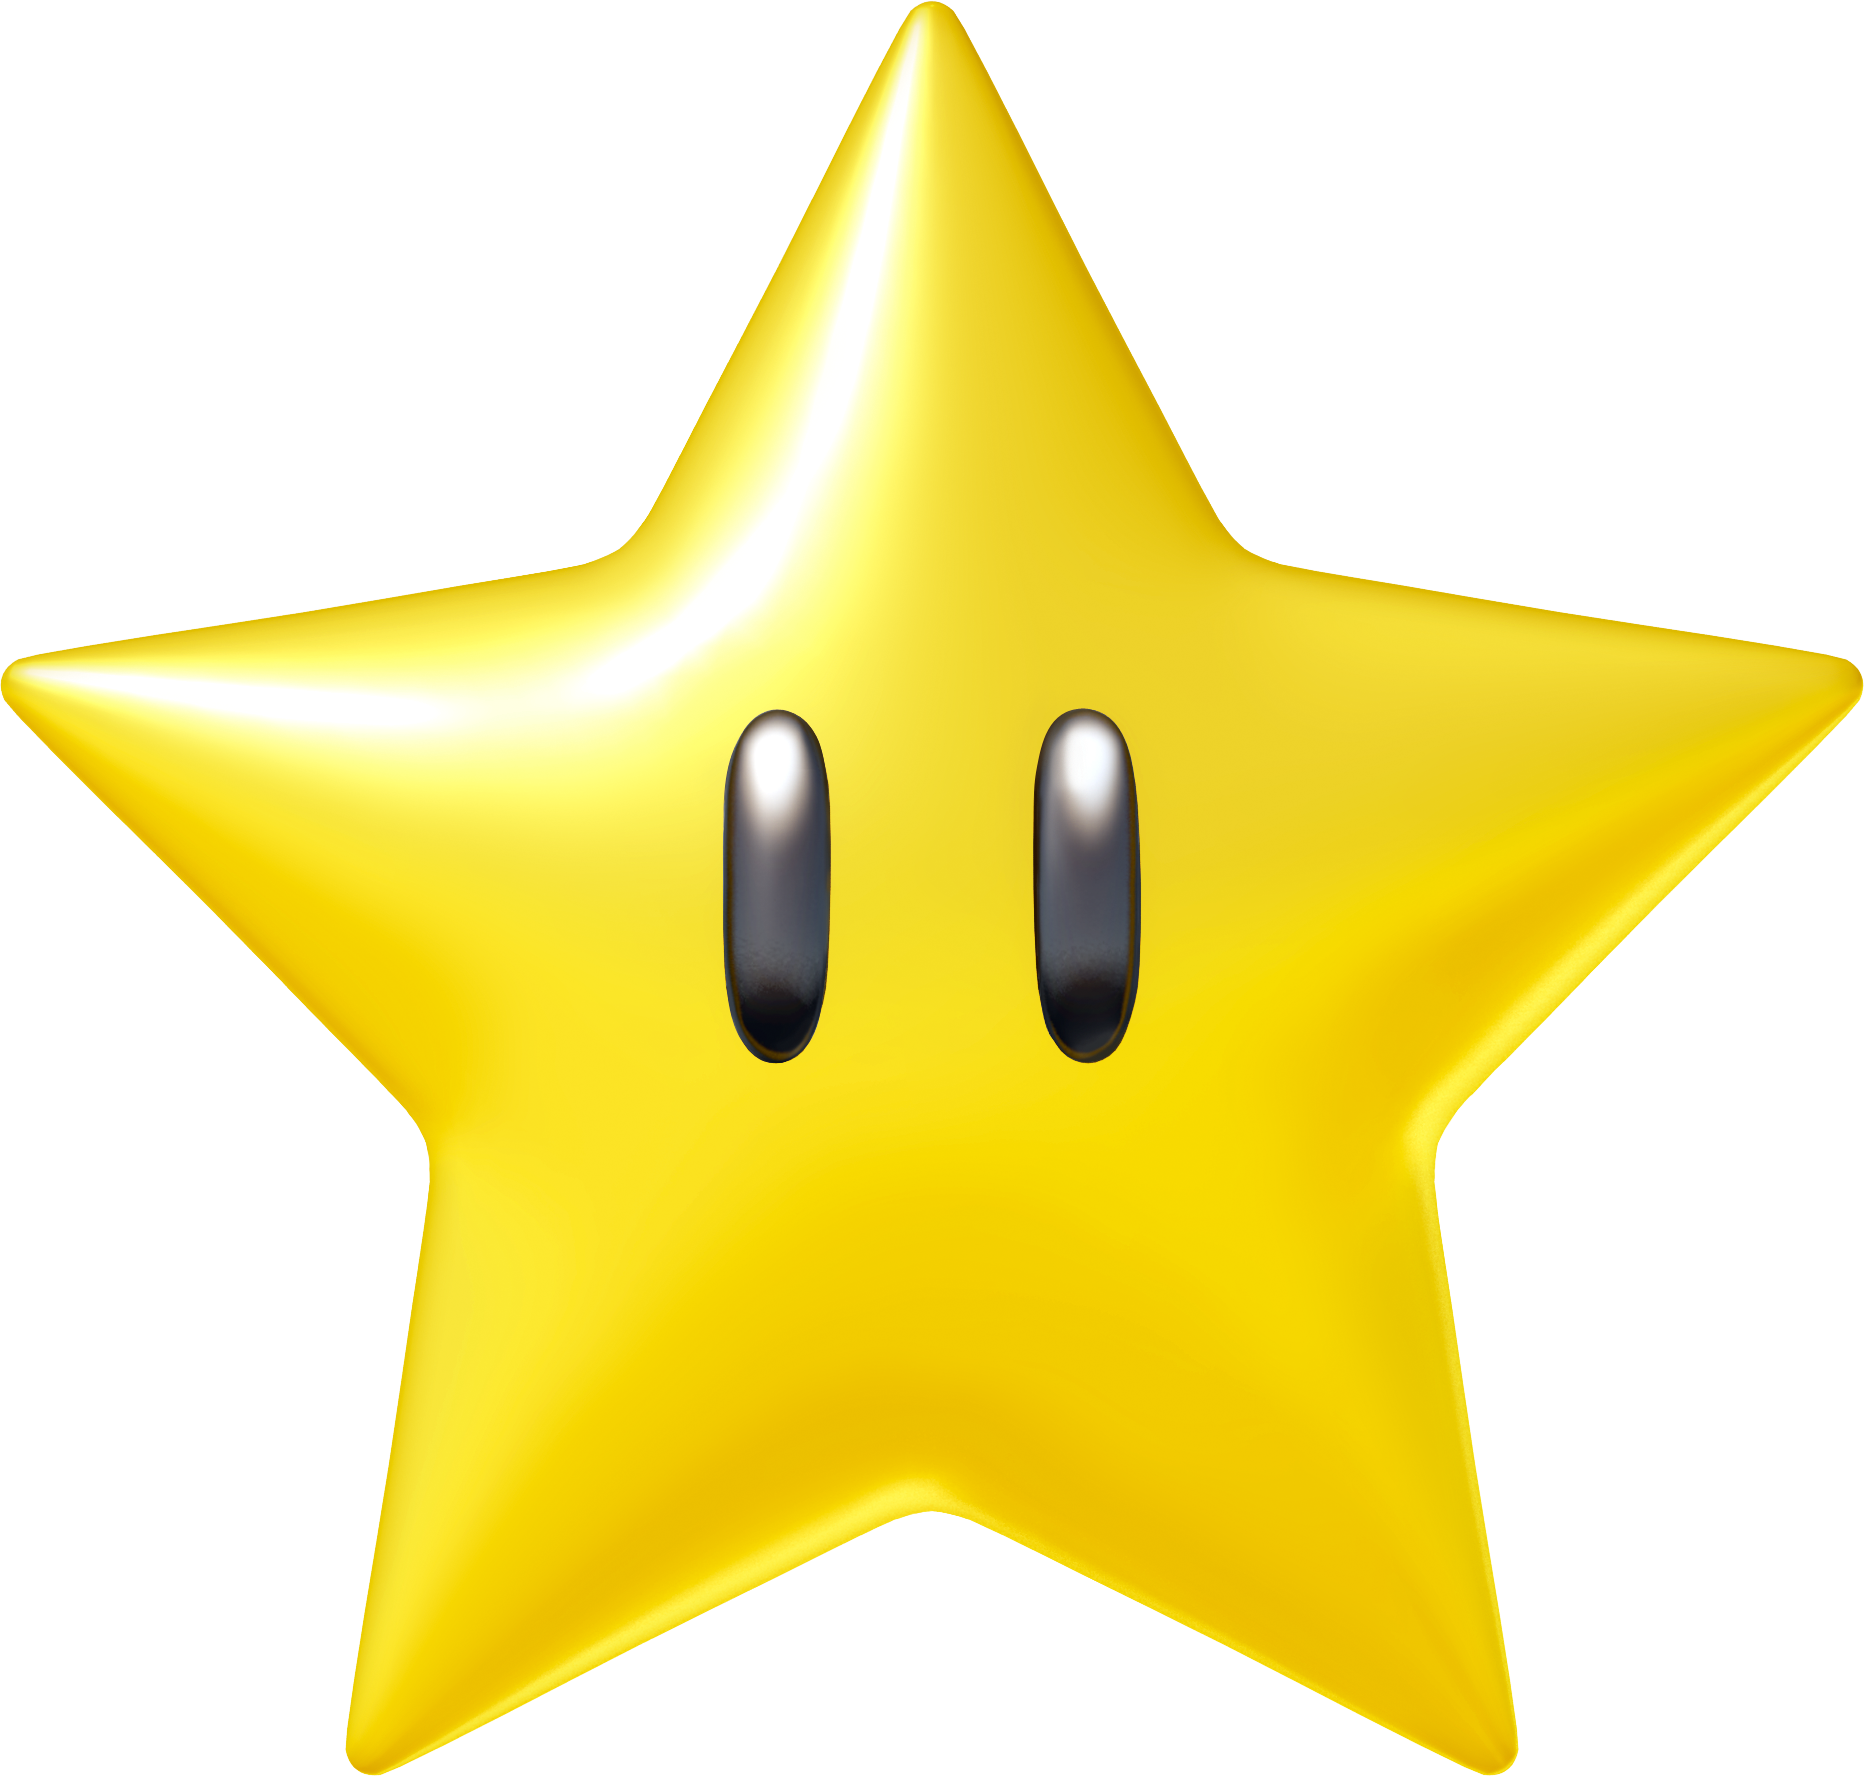 Mario Kart 8 (Wii U) Character, Item, Logo & Misc HD Artwork